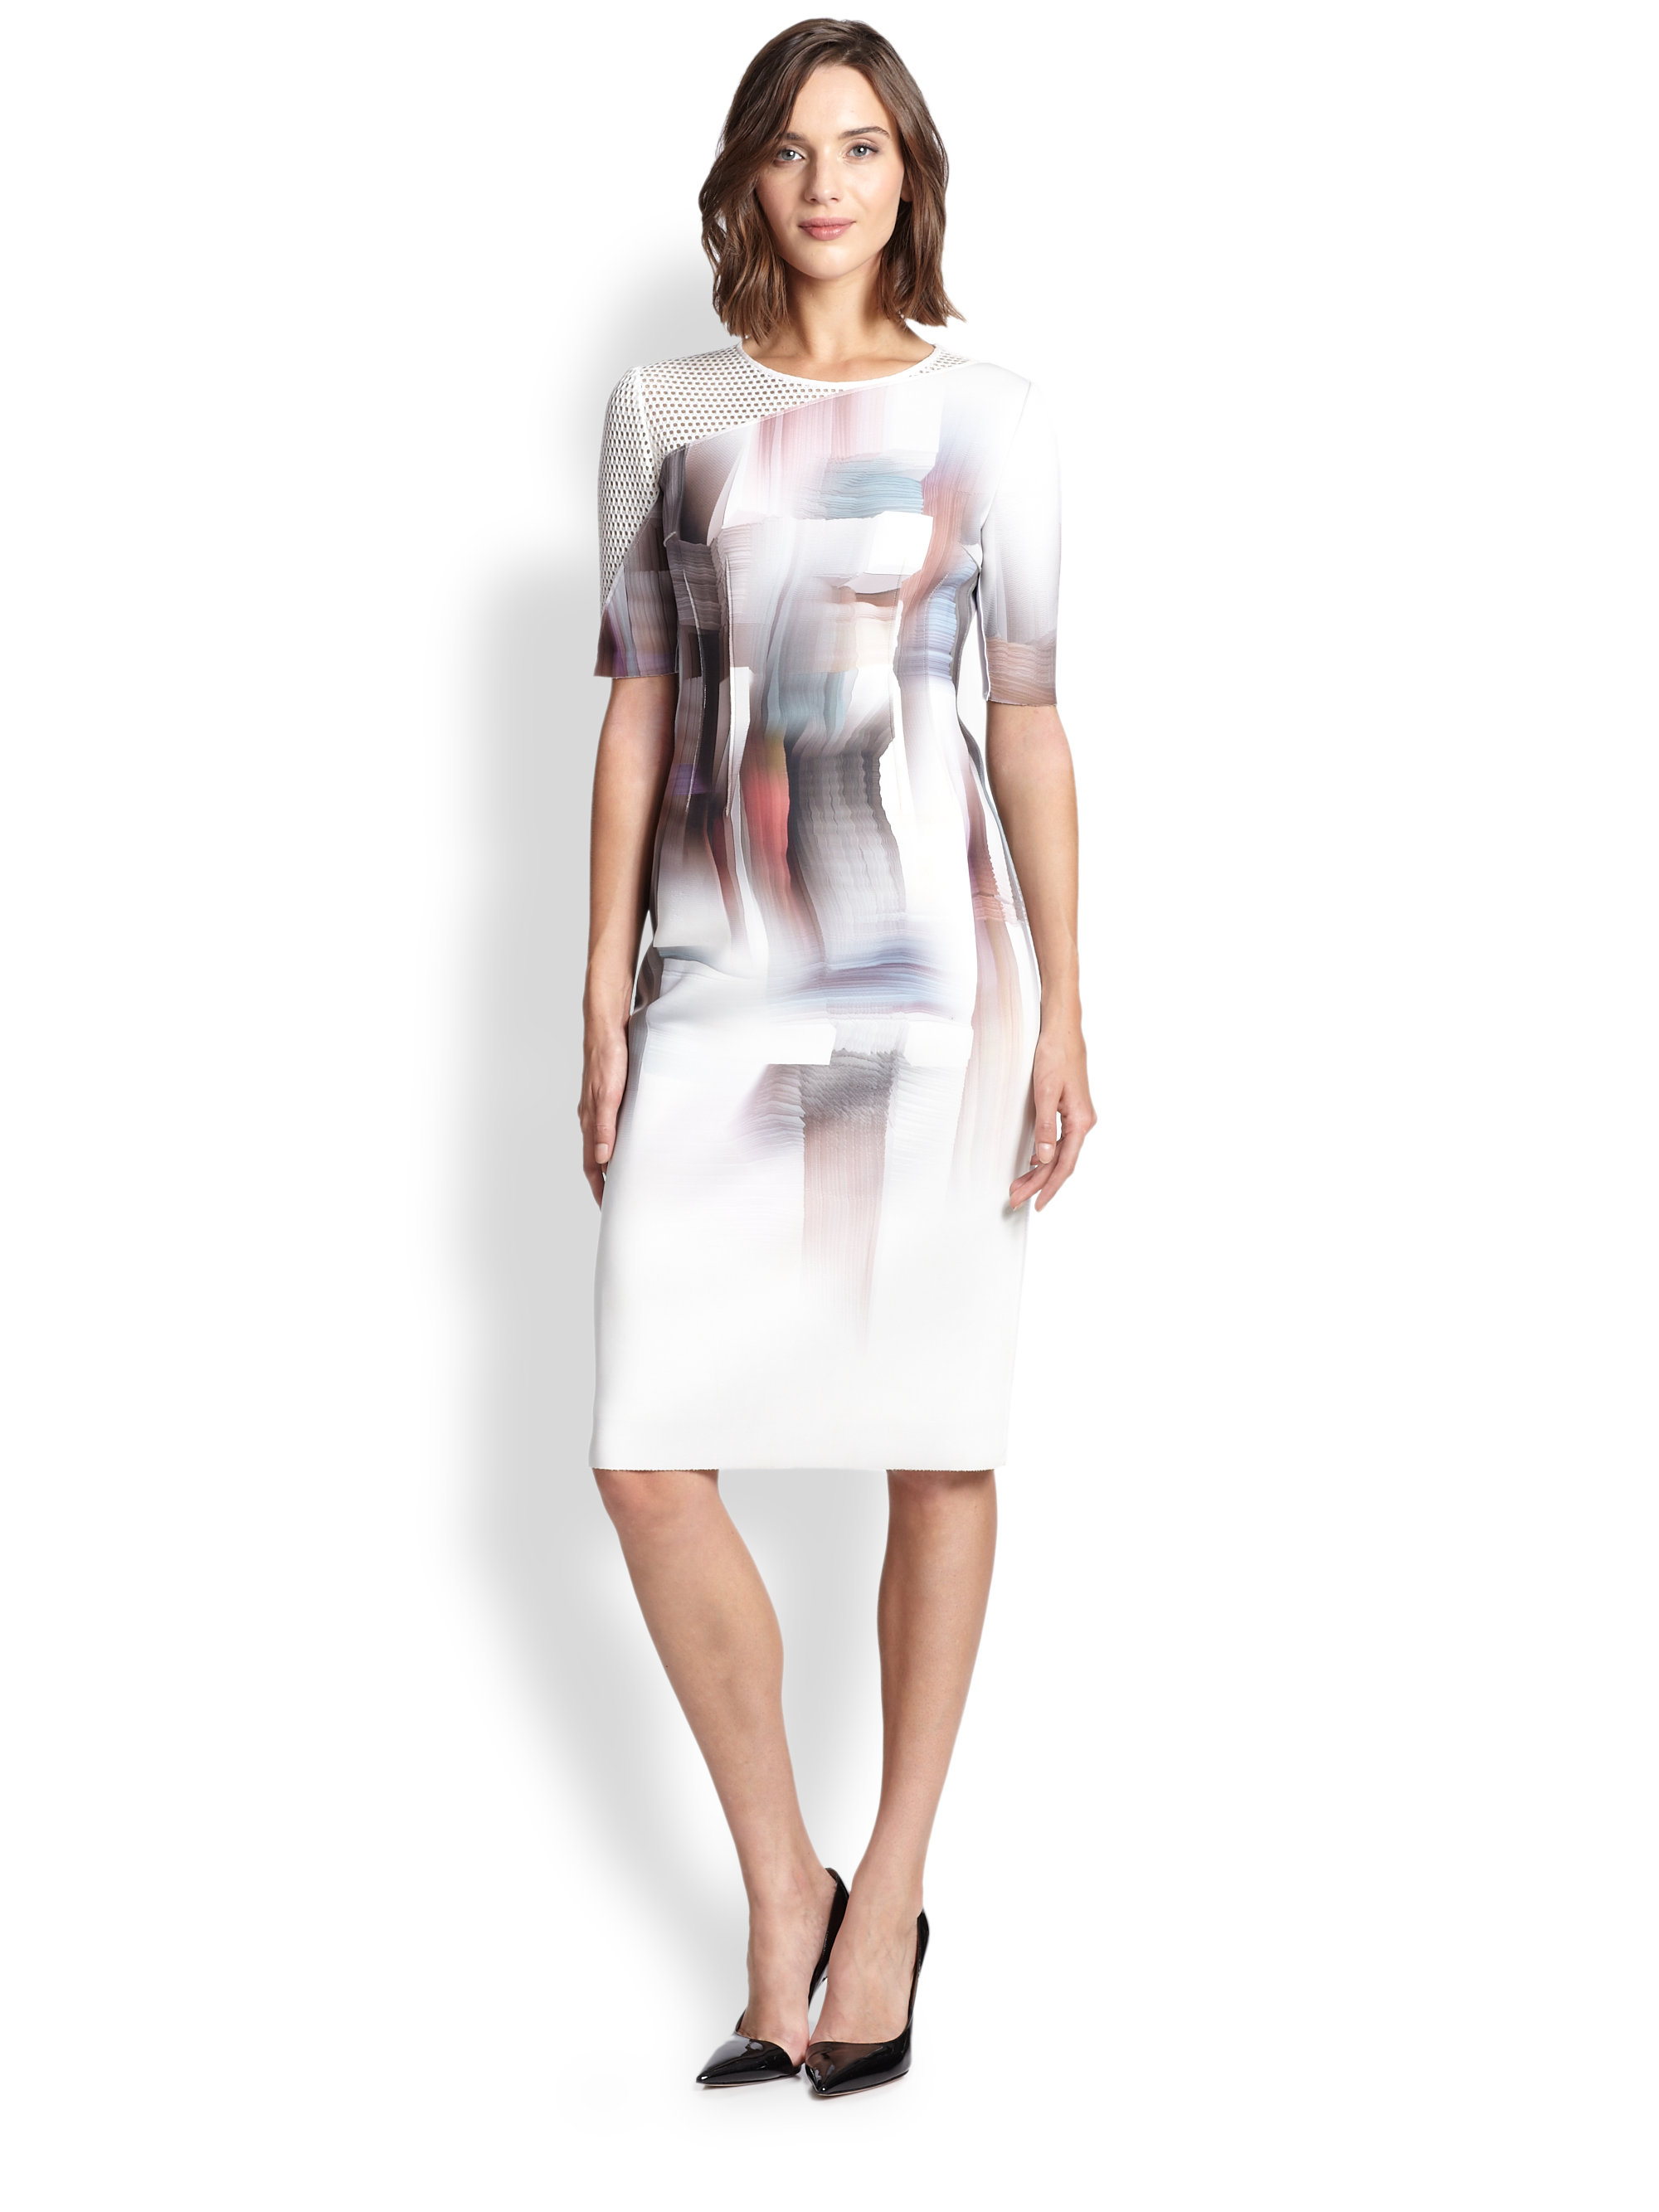 faf4f092ed Elie Tahari Carla Dress in White - Lyst